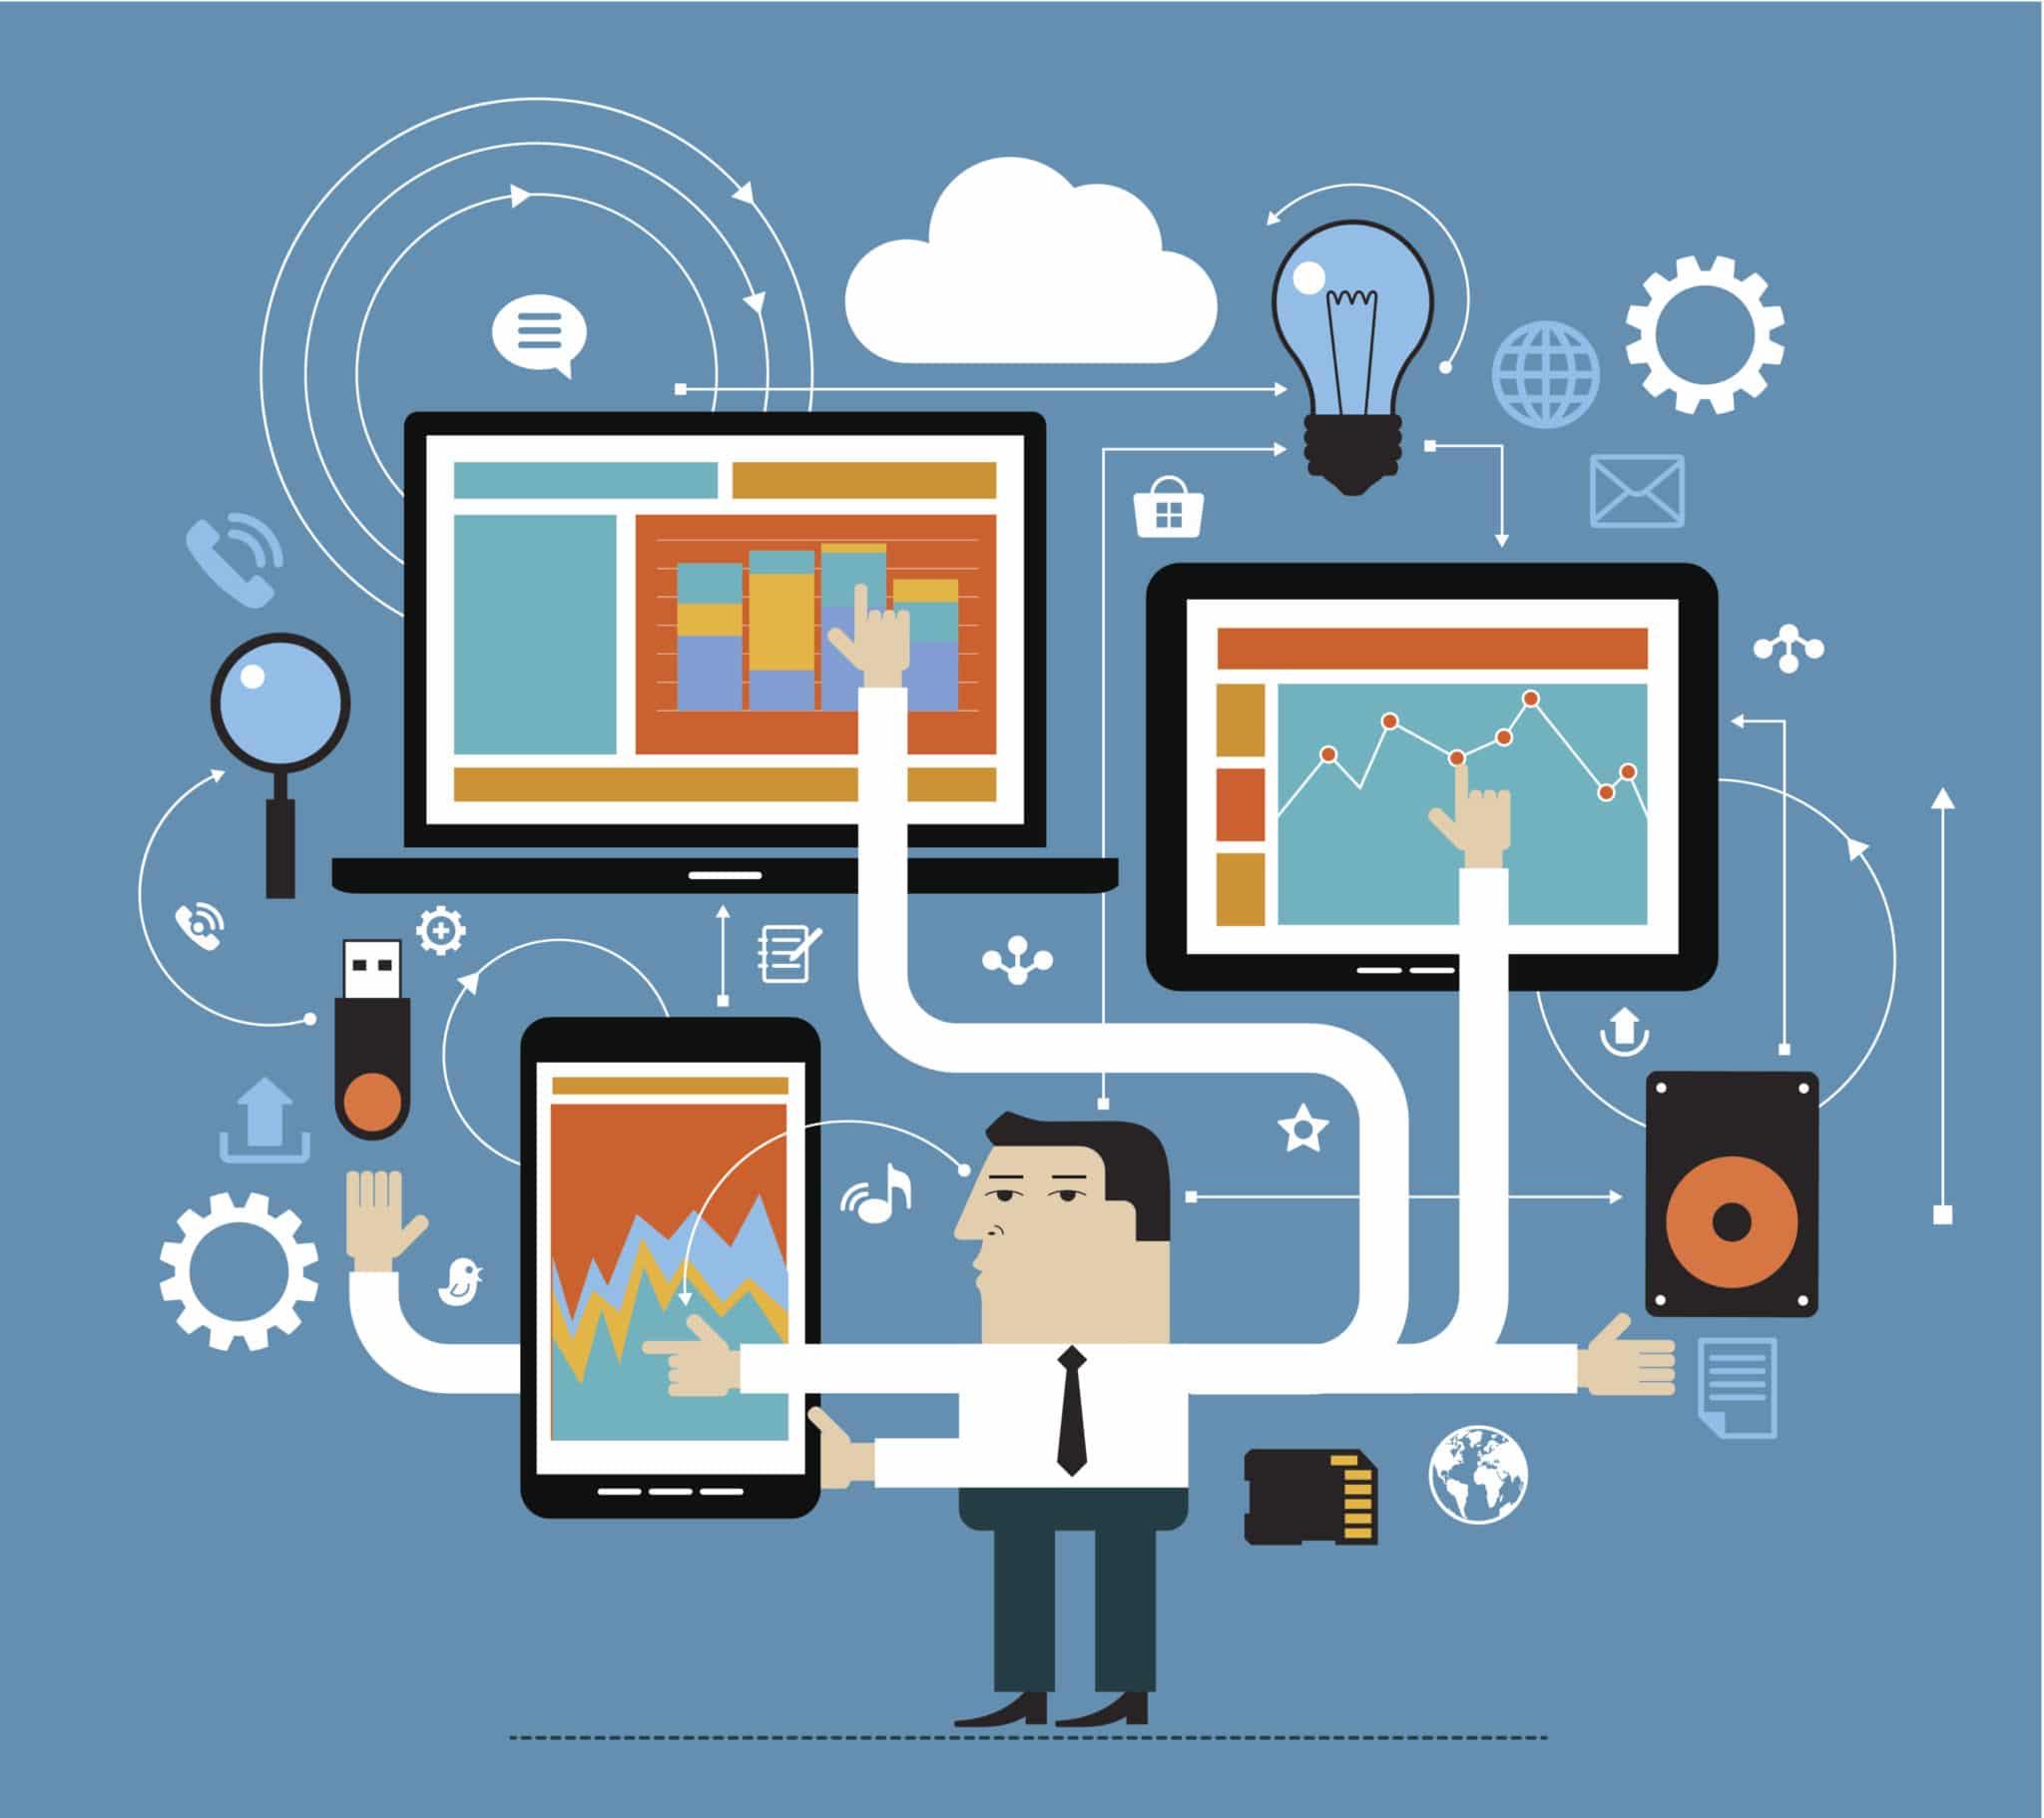 Project Management Software Work Smarter